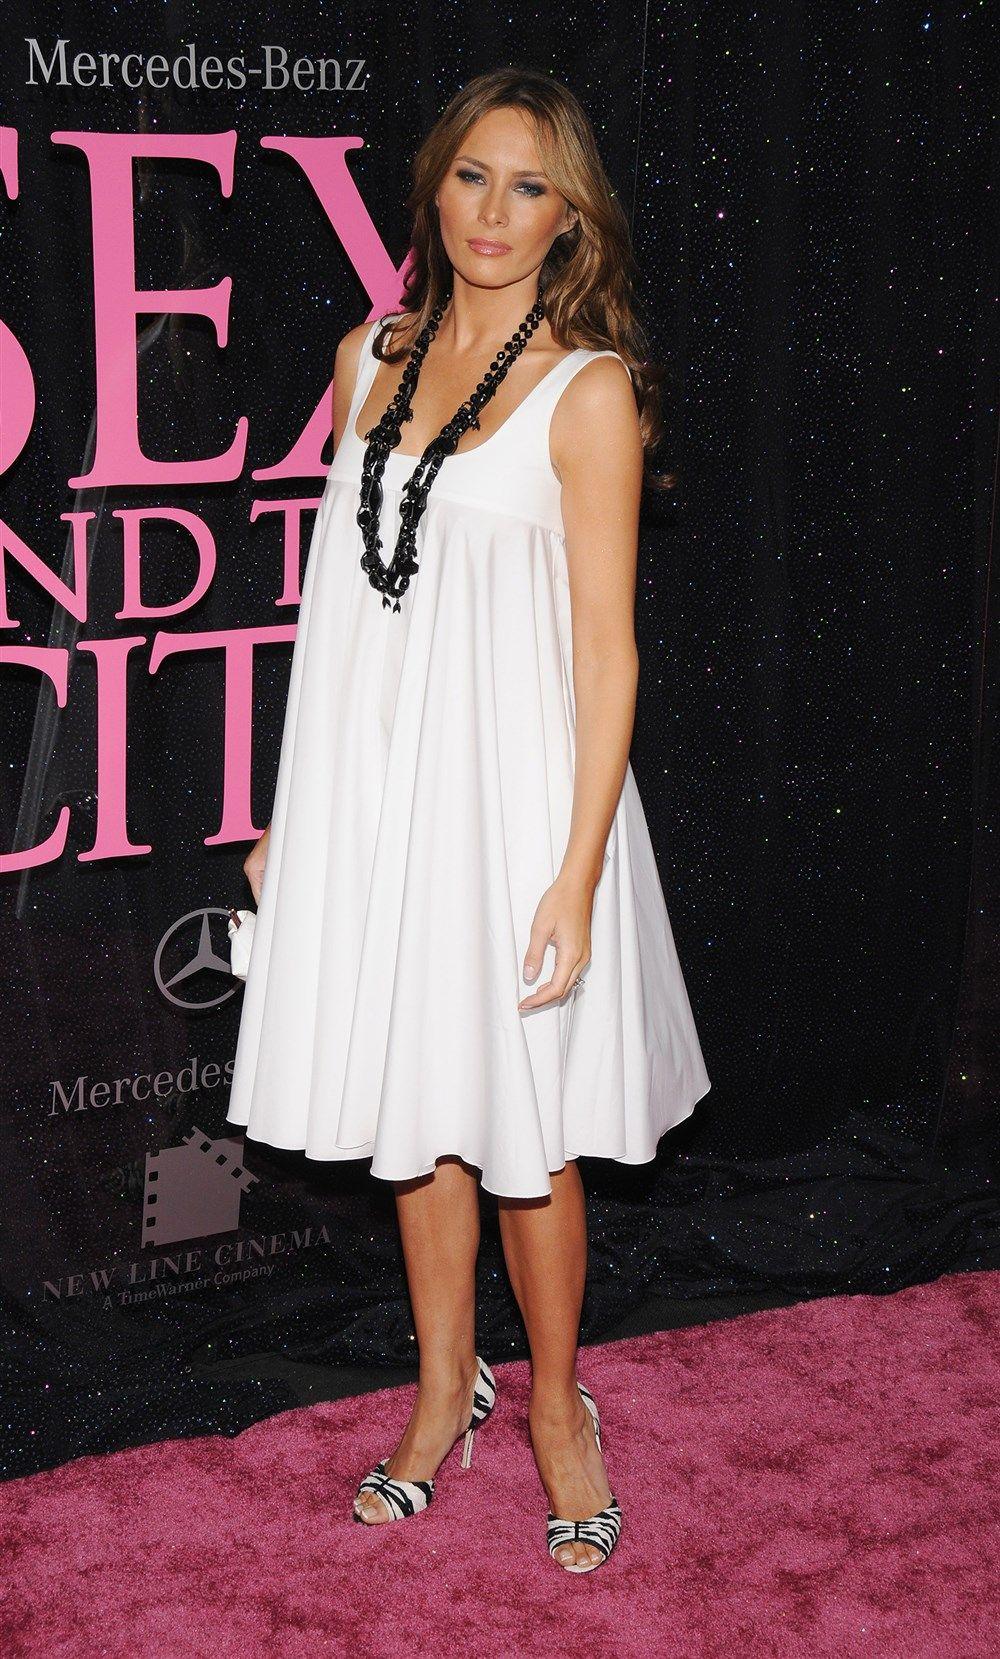 Melania Trump S Fashion Evolution From Model To First Lady Trump Fashion Fashion Evolution Of Fashion